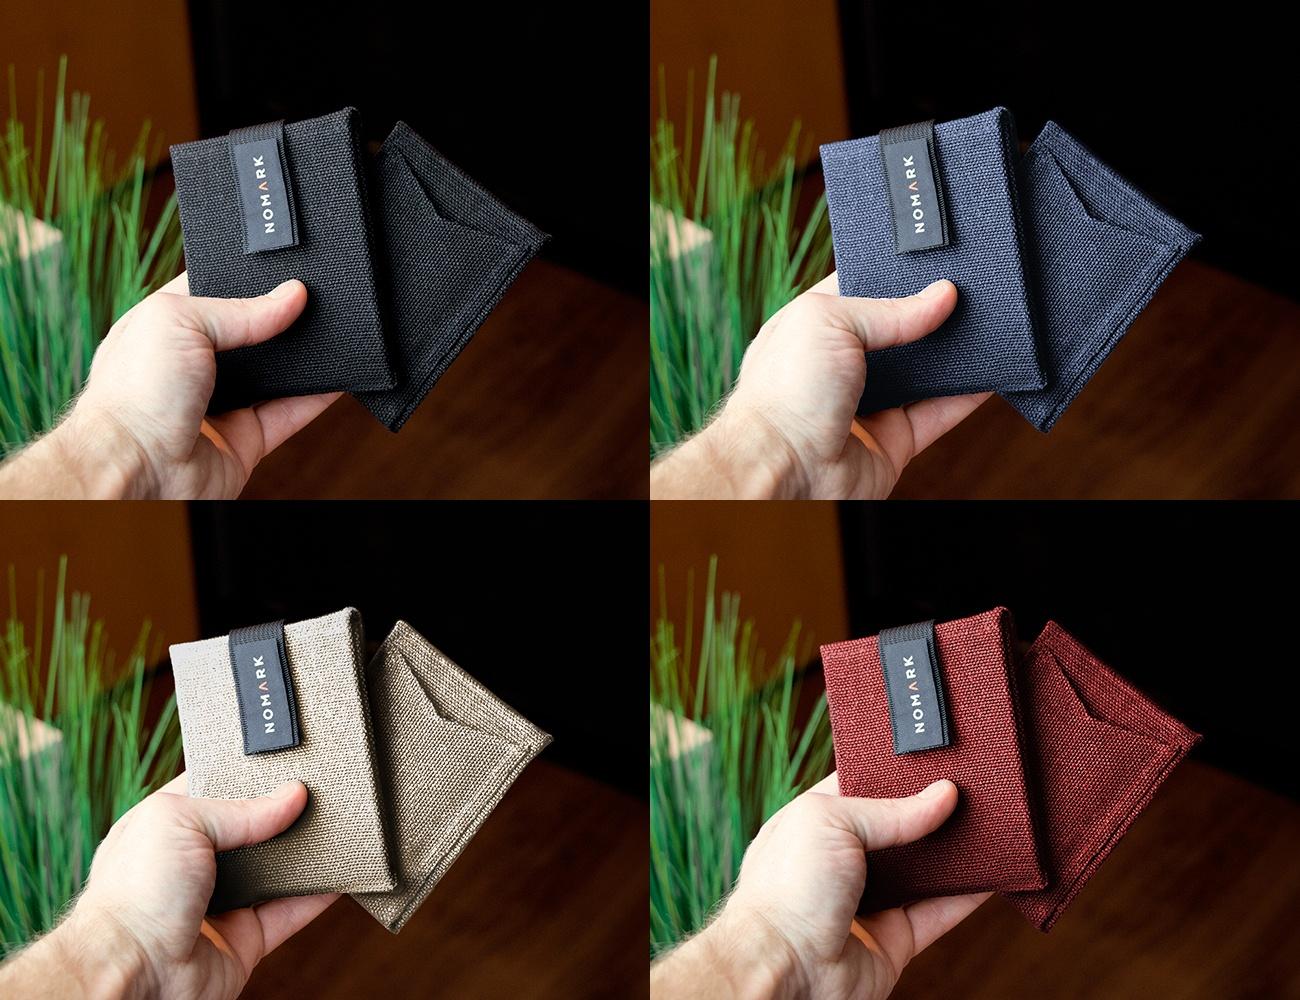 Mark I Signature Eco-Friendly Wallet